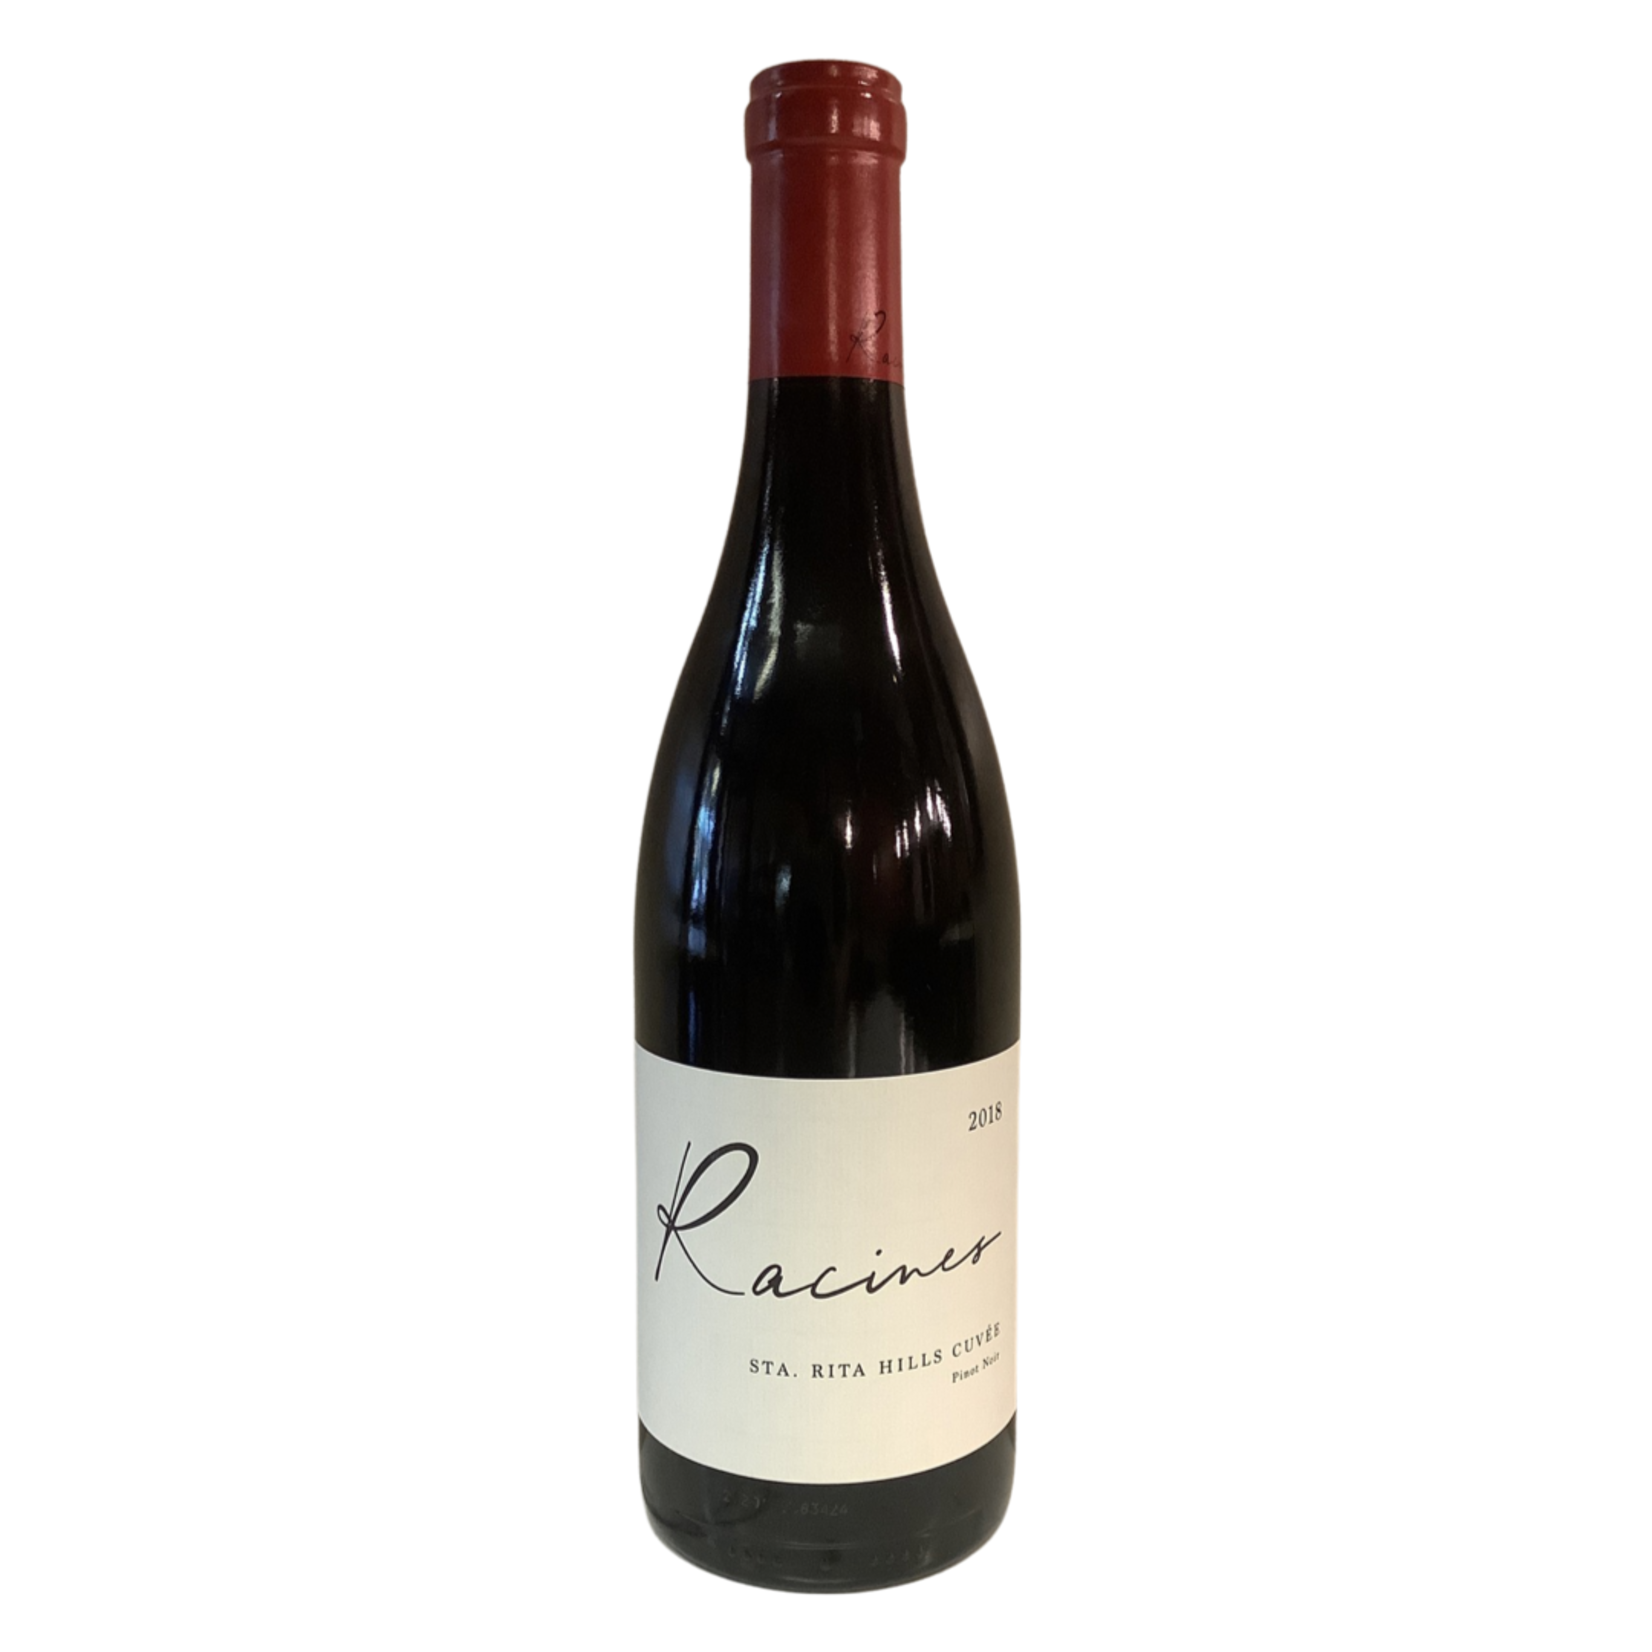 2018 Racines Pinot Noir, Santa Rita Hills CA